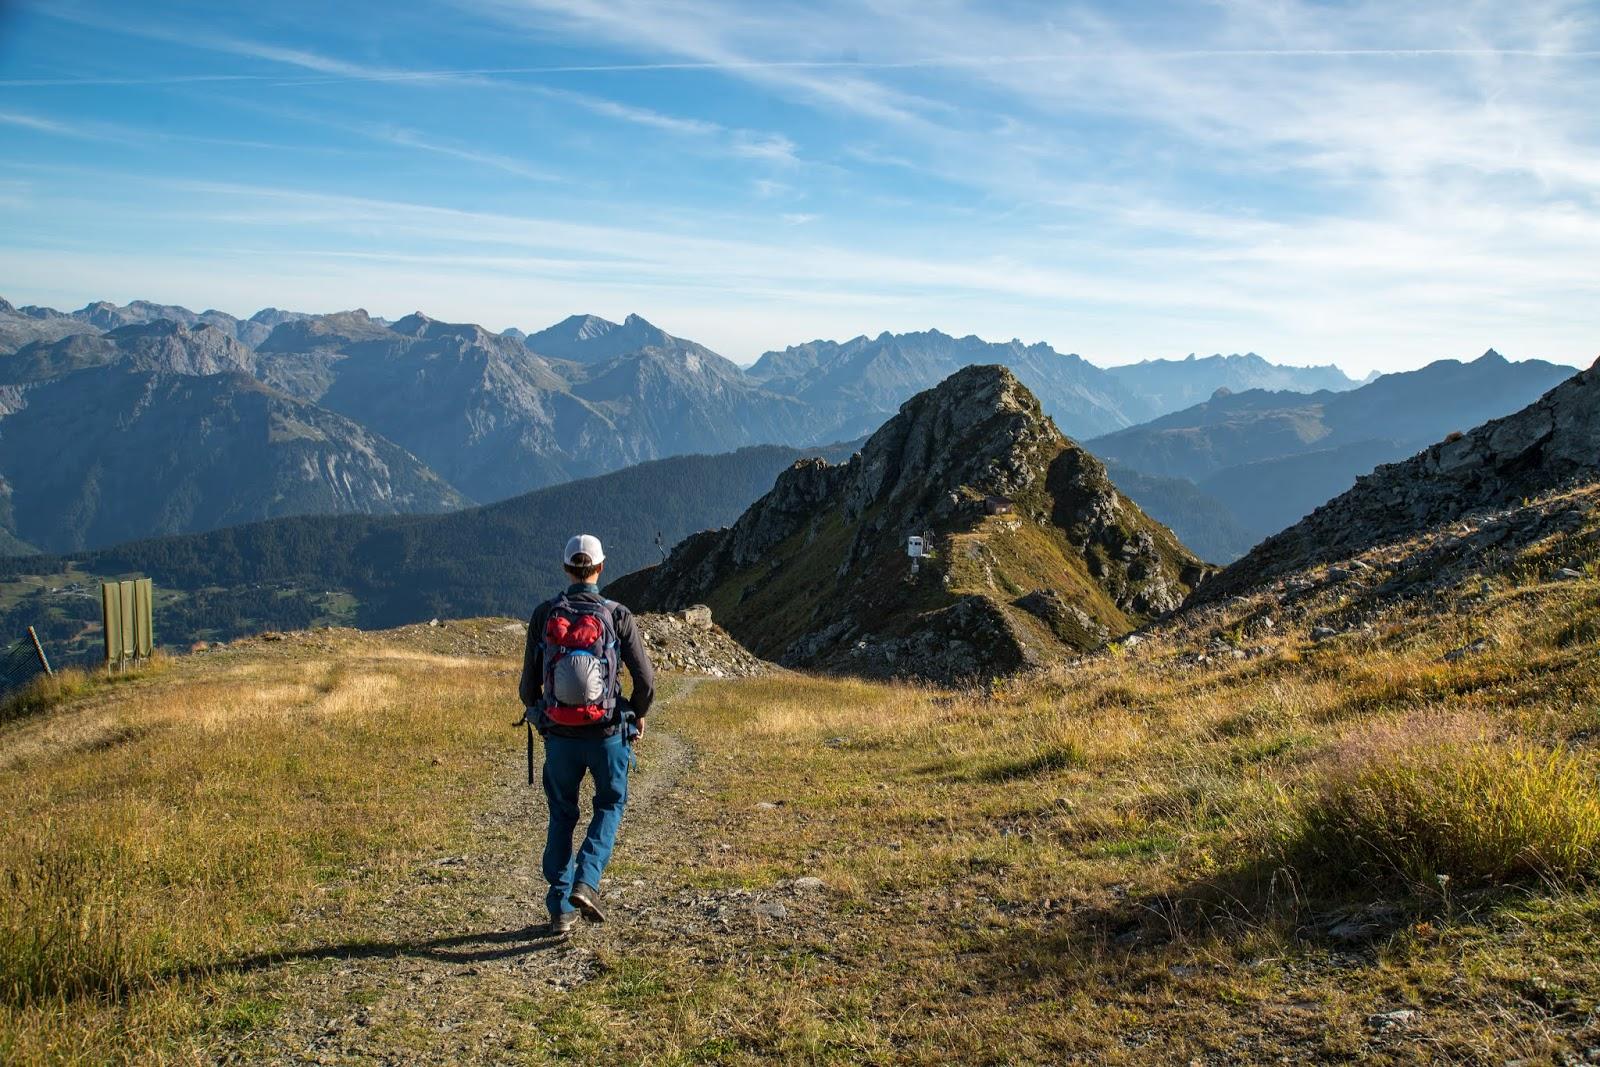 Klettersteig Hochjoch : Gipfelbuch verhältnisse hochjoch m ü